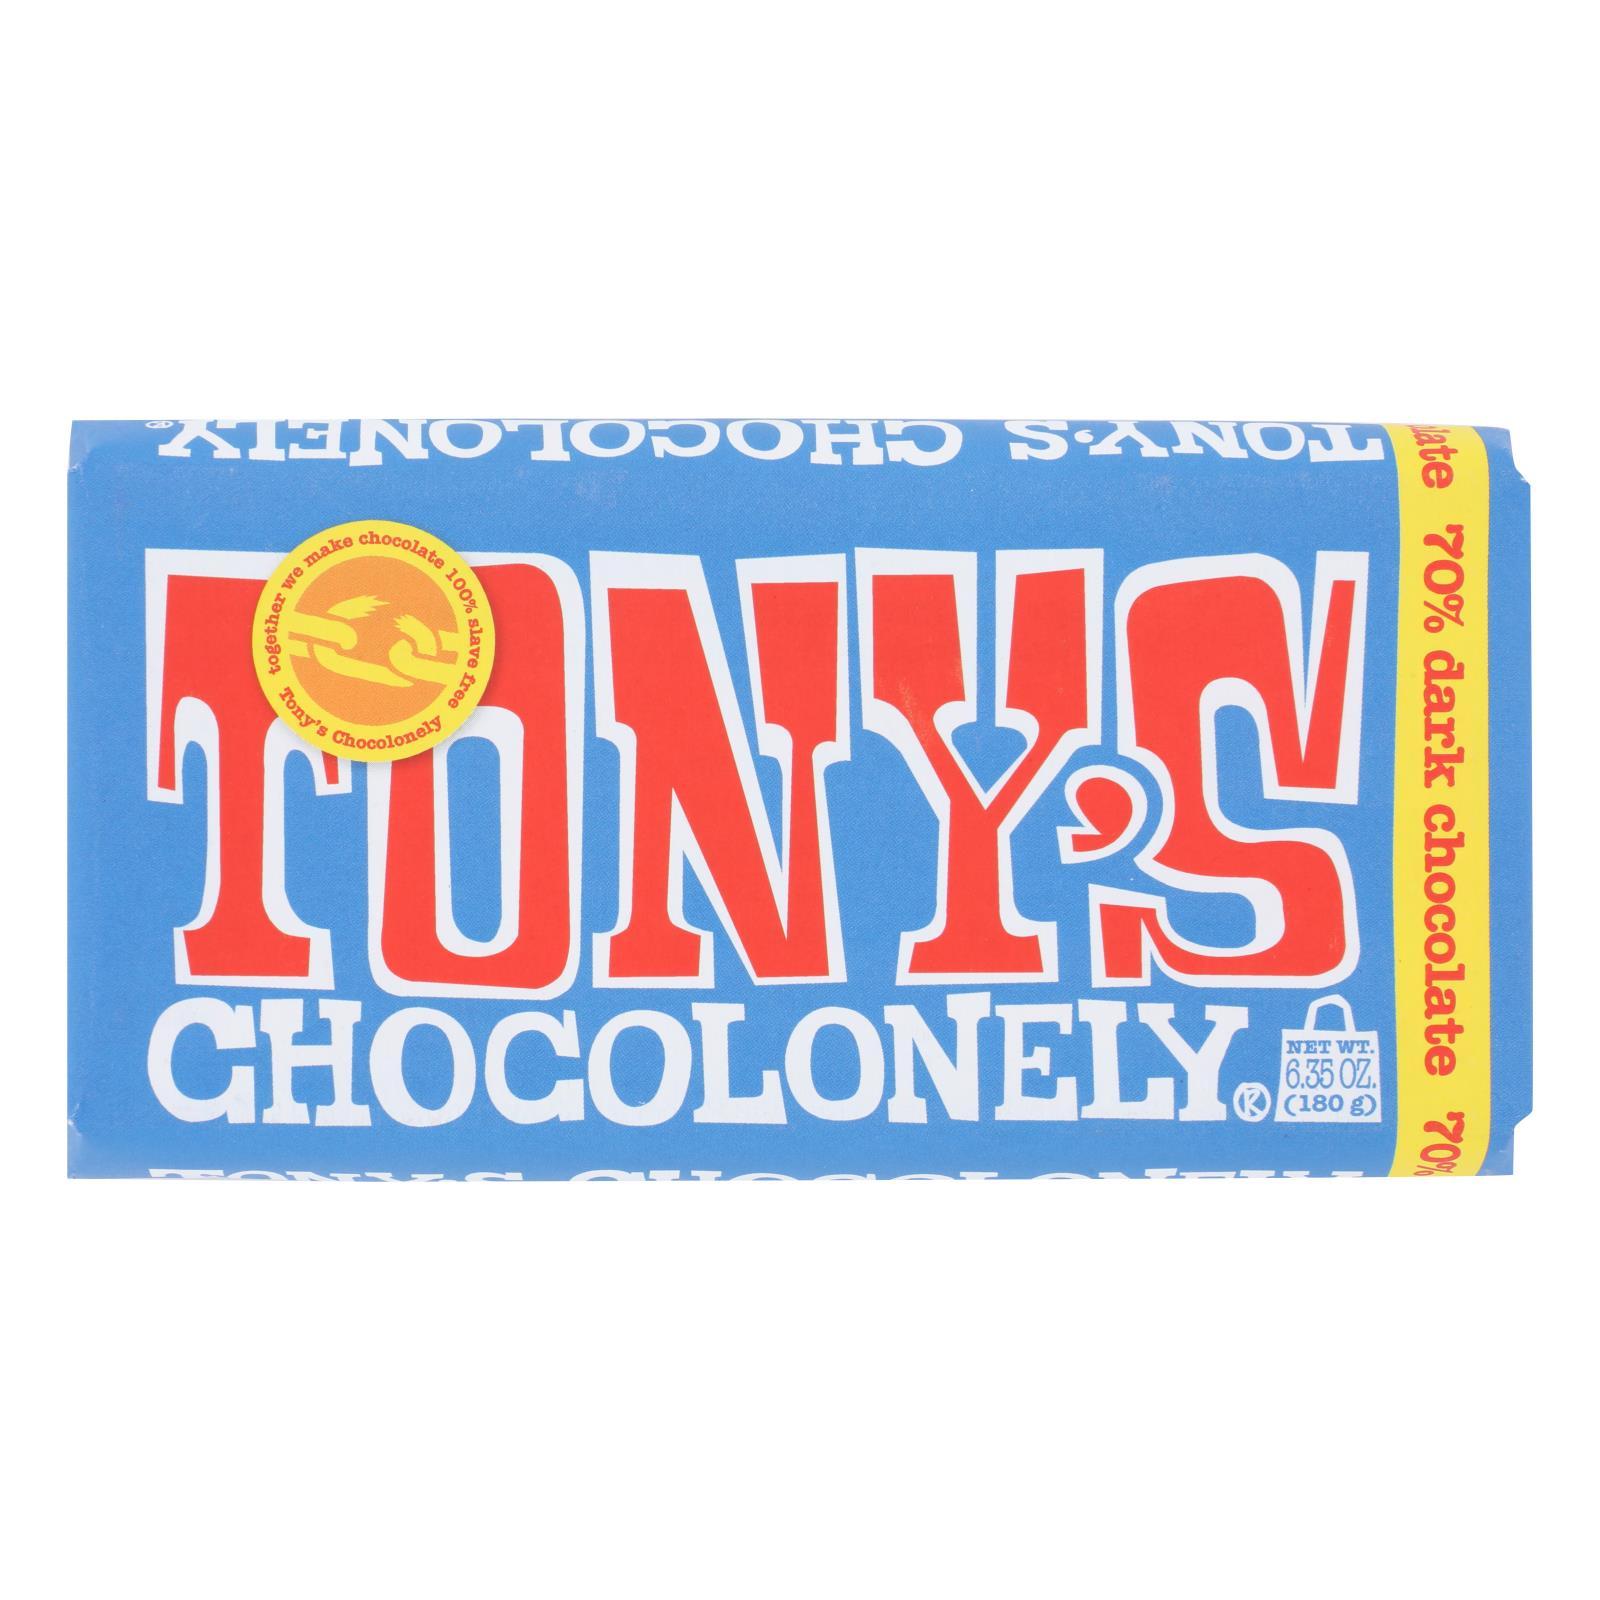 Tony's Chocolonely - Bar Chocolate Xtra Dark 70% - Case of 15 - 6.35 OZ